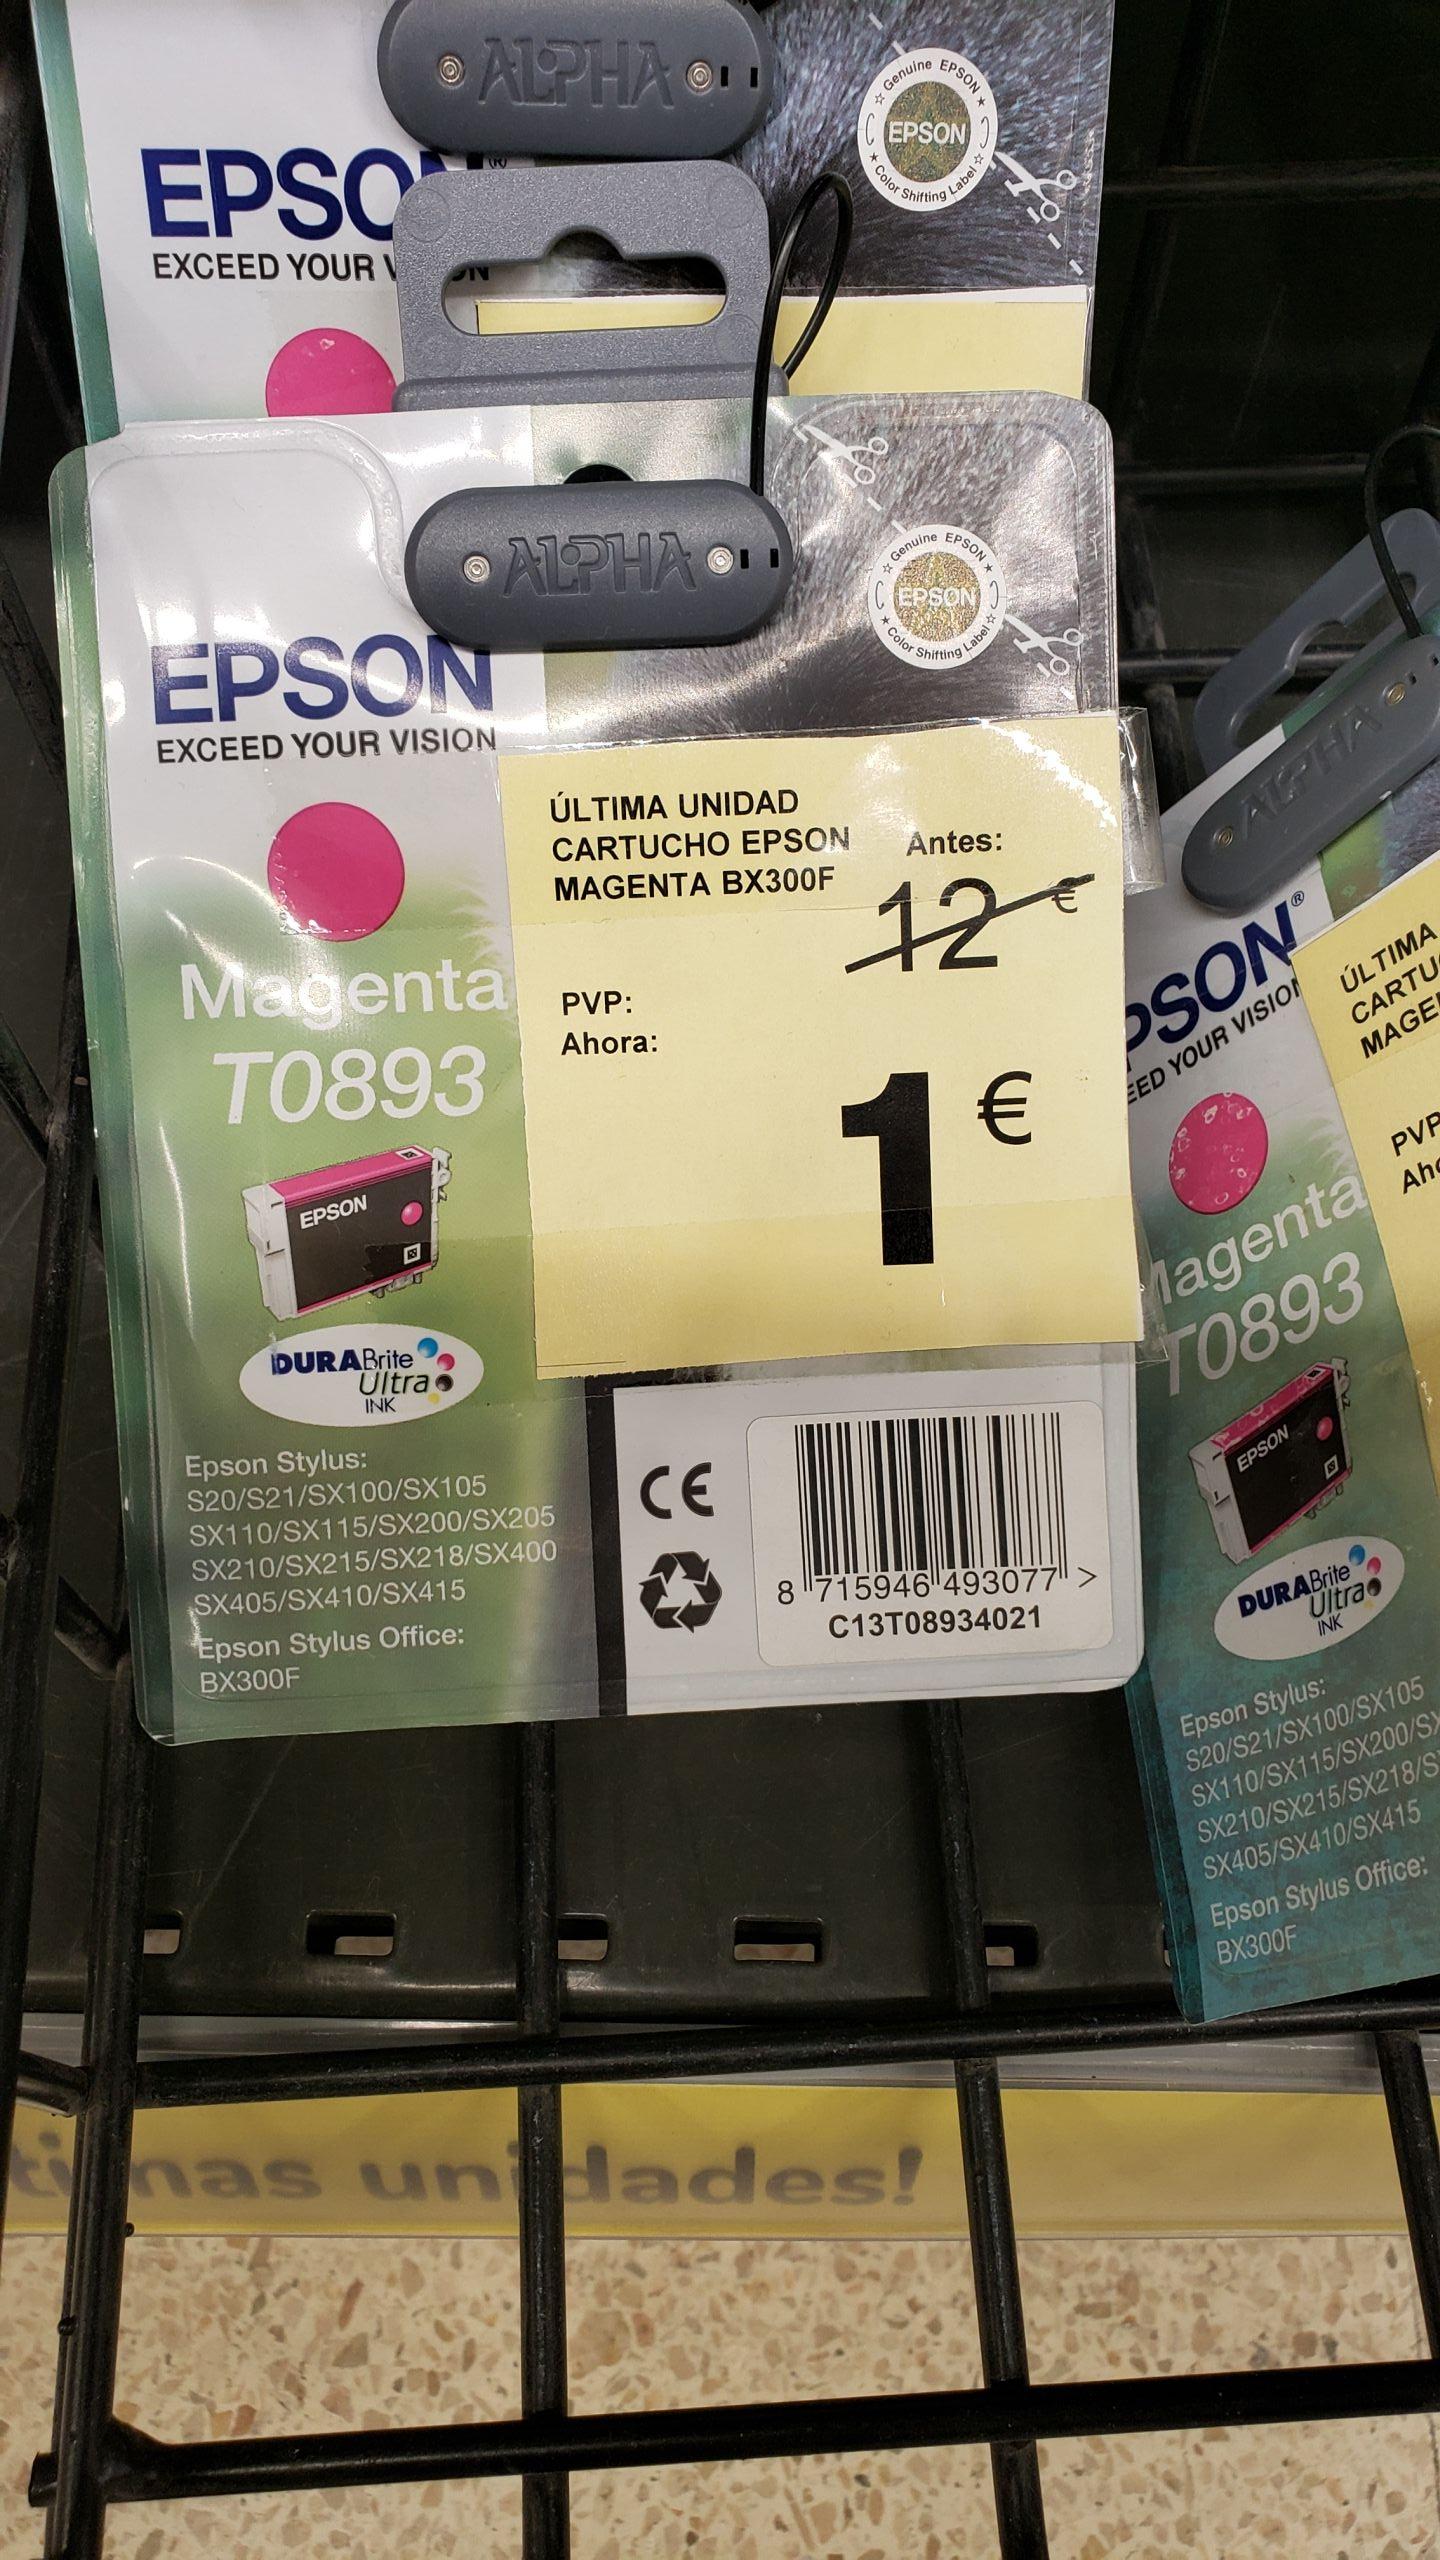 Cartucho Epson Magenta BX300F en Carrefour C.C Añaza tenerife